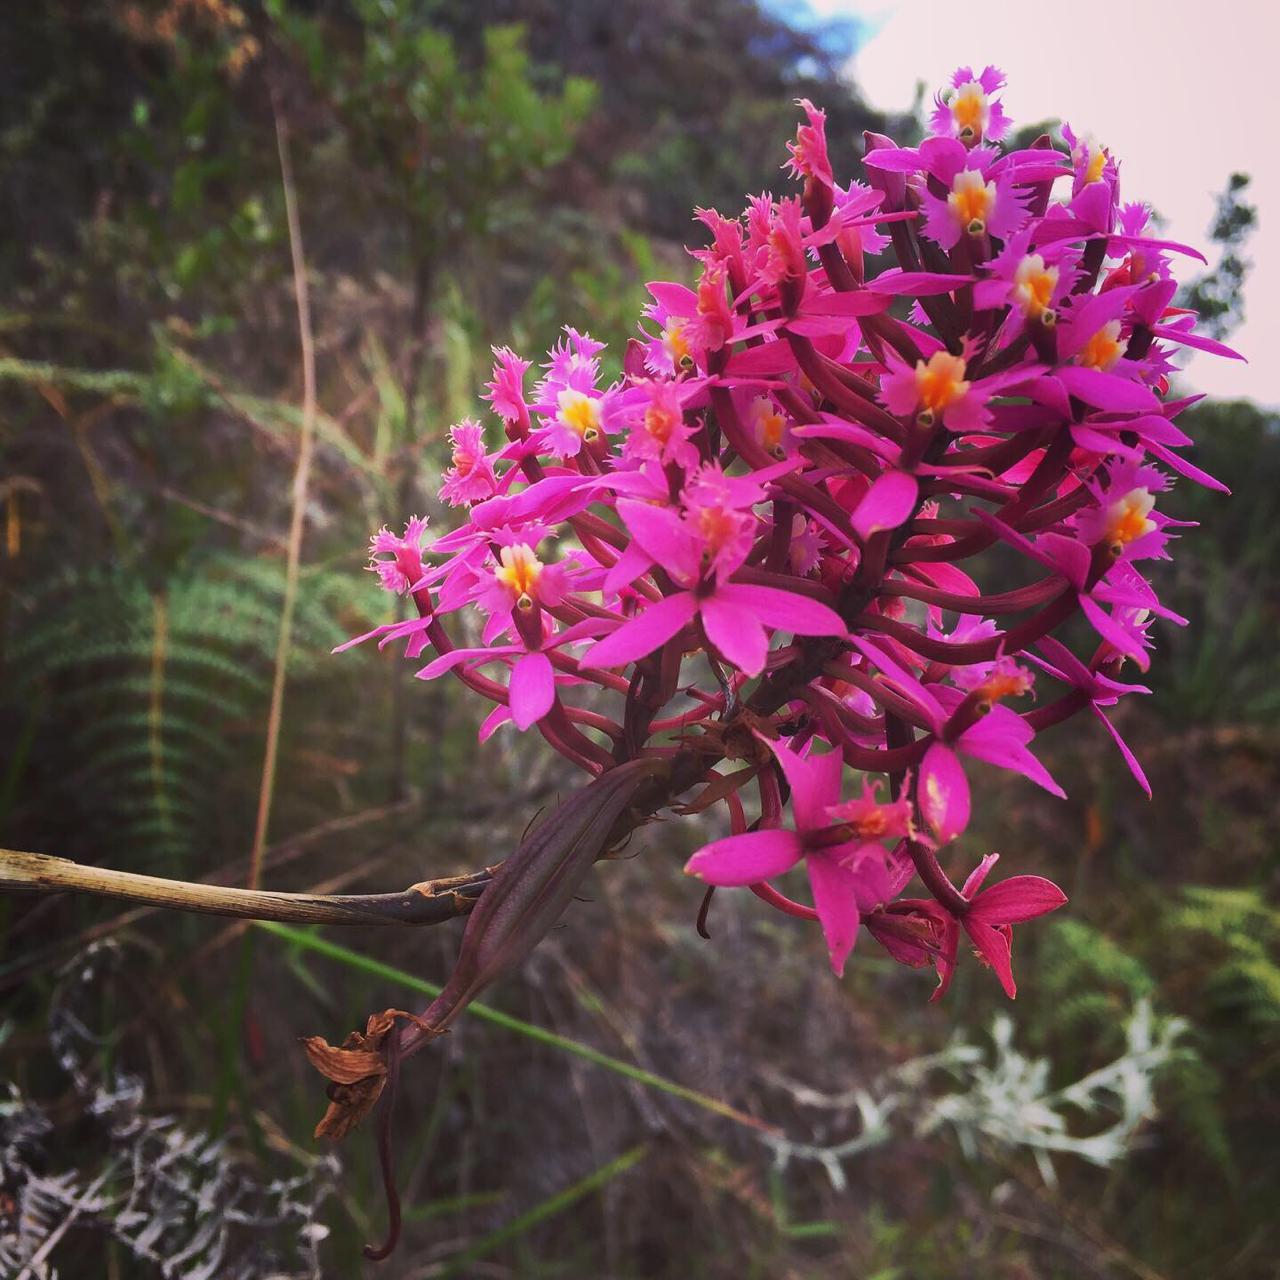 Epidendrum jamiesonis